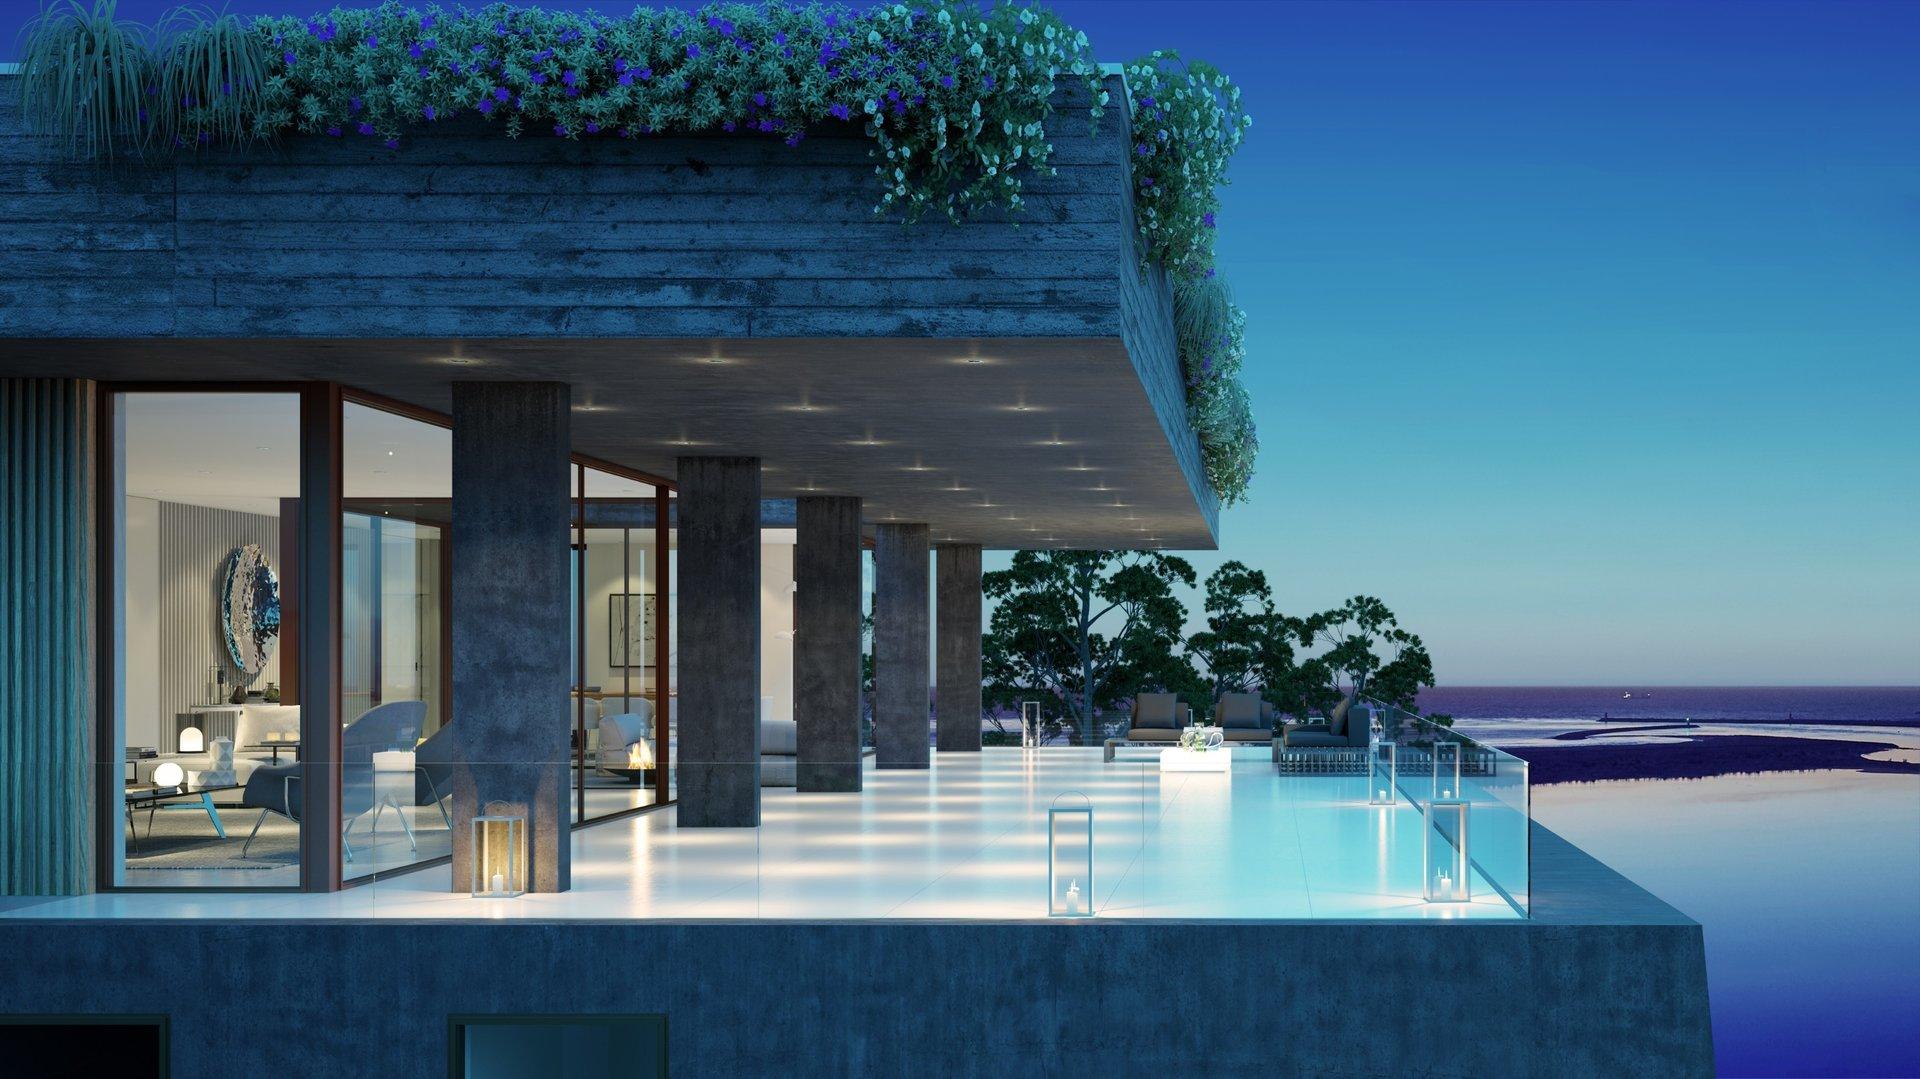 4 Bedroom Villa Vila Nova de Gaia, Porto Ref: ASV215A